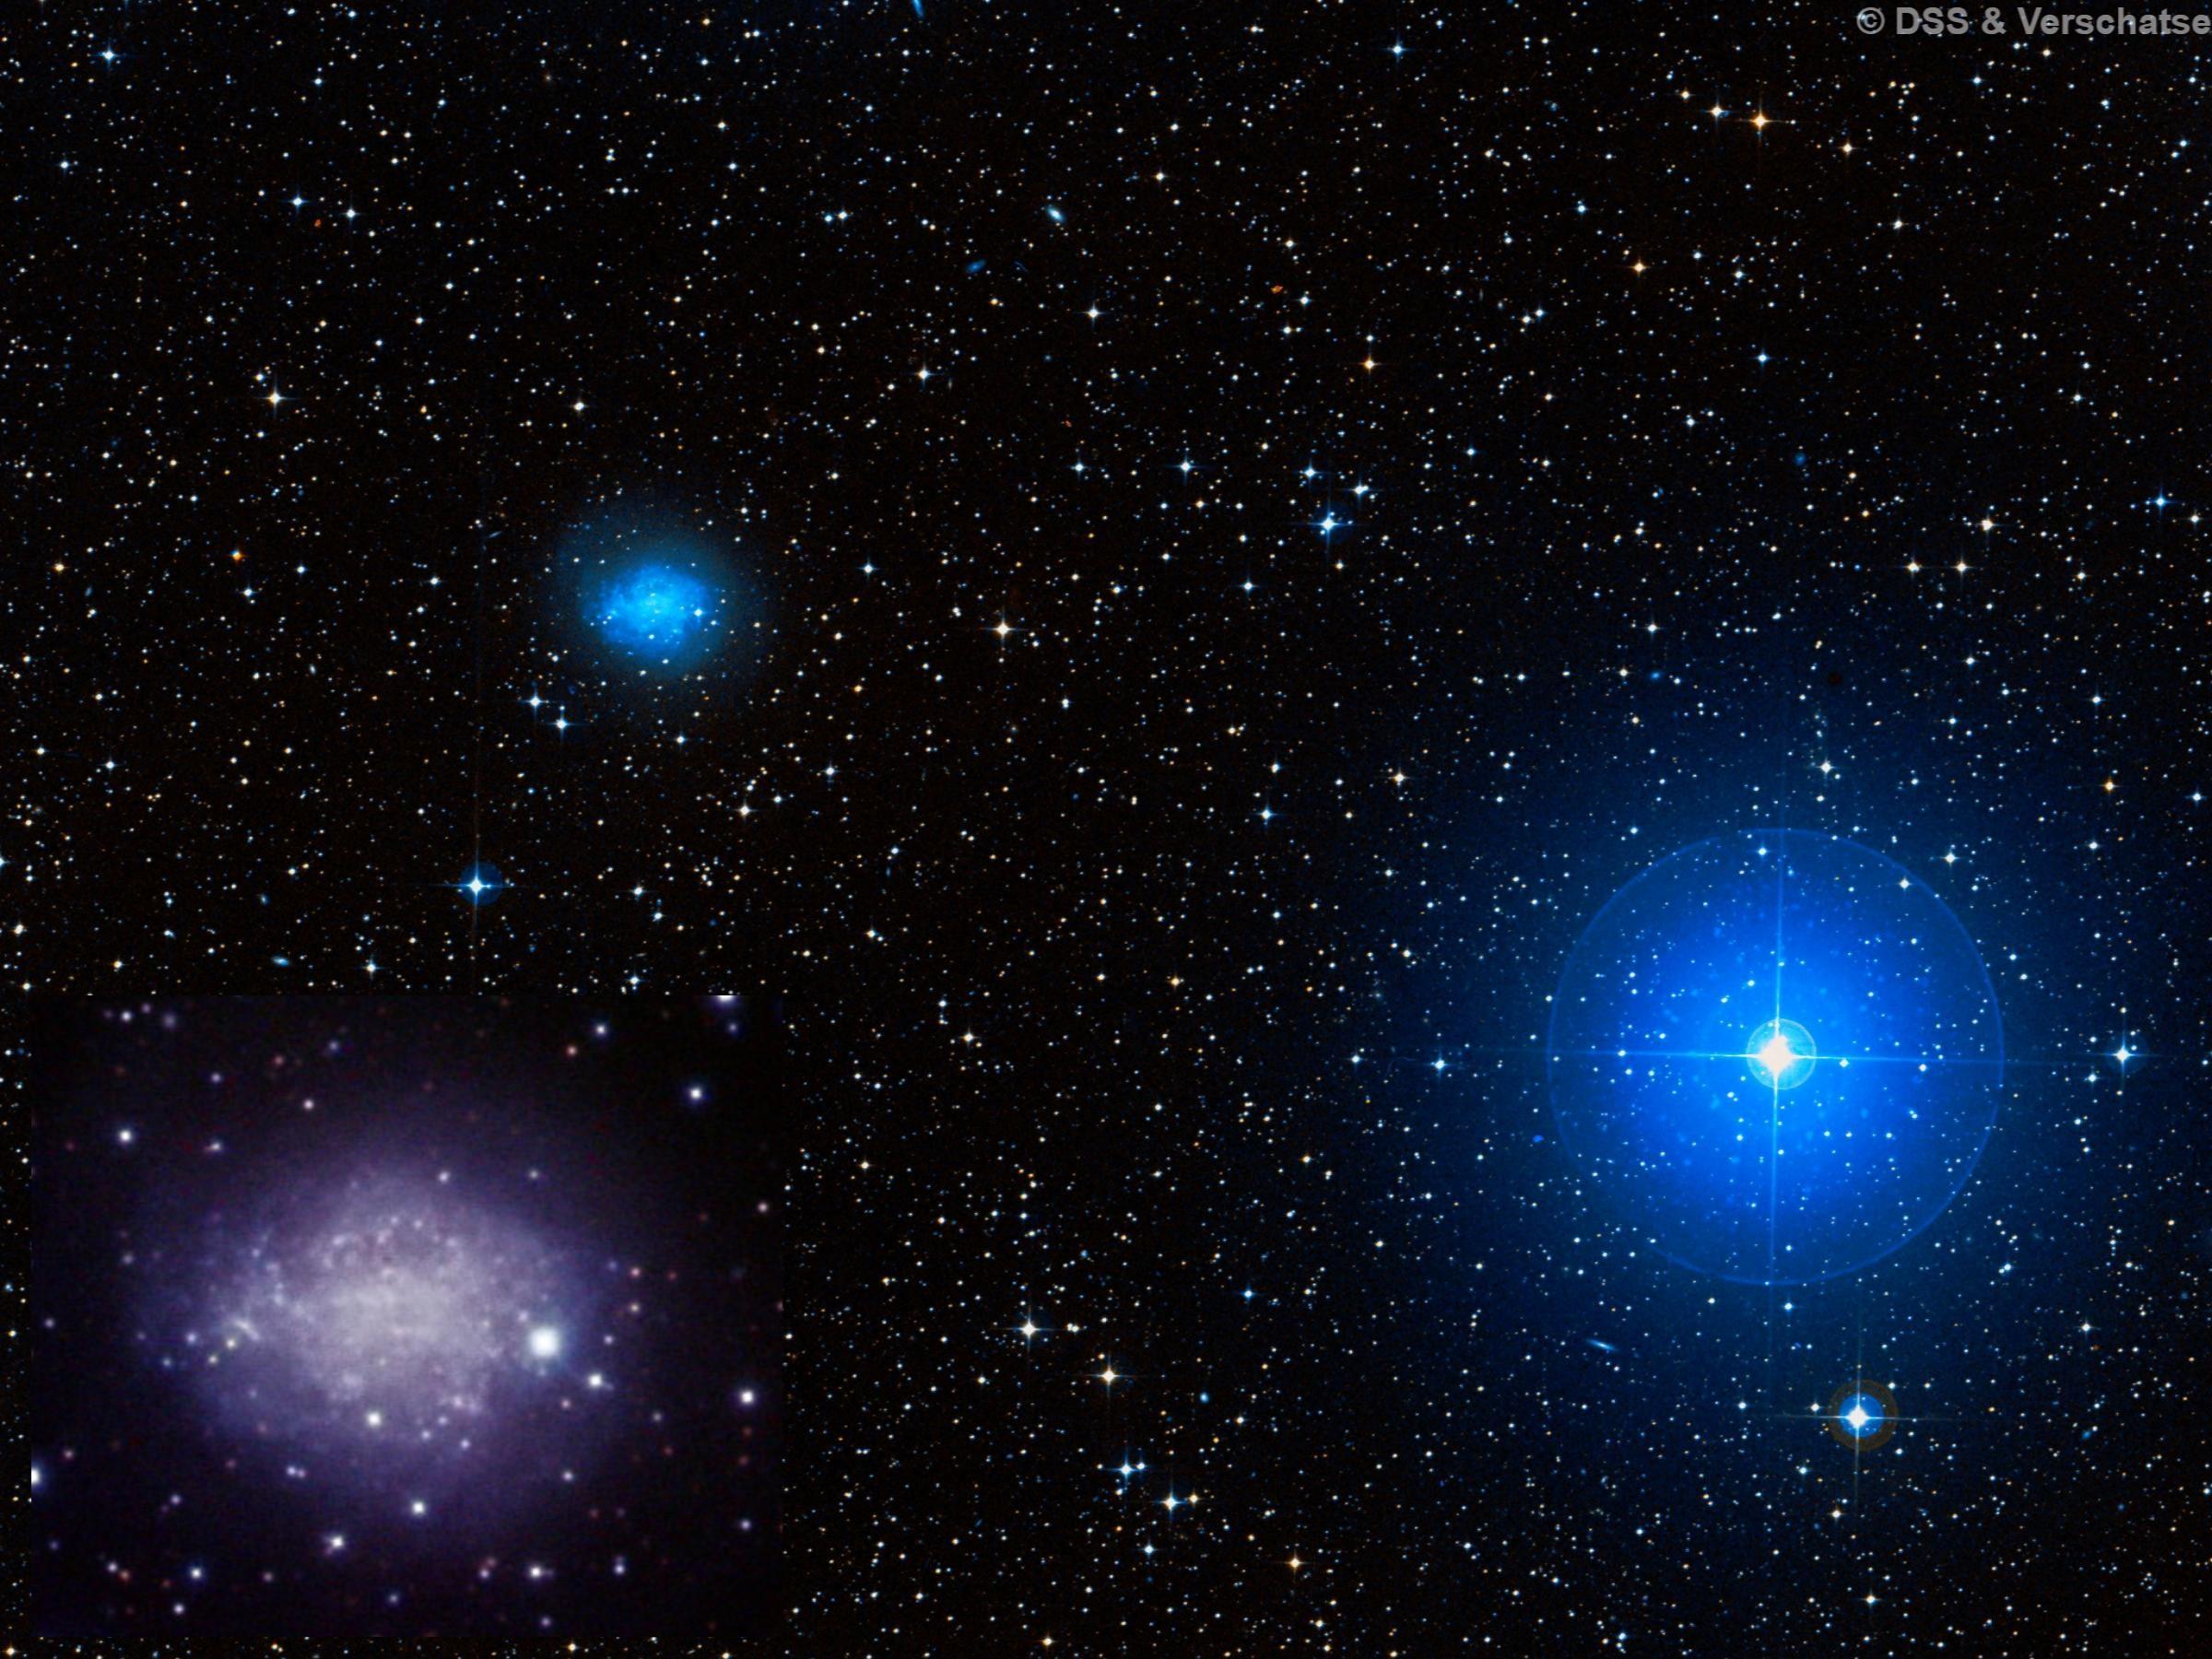 PGC 49050 = ESO 383-87